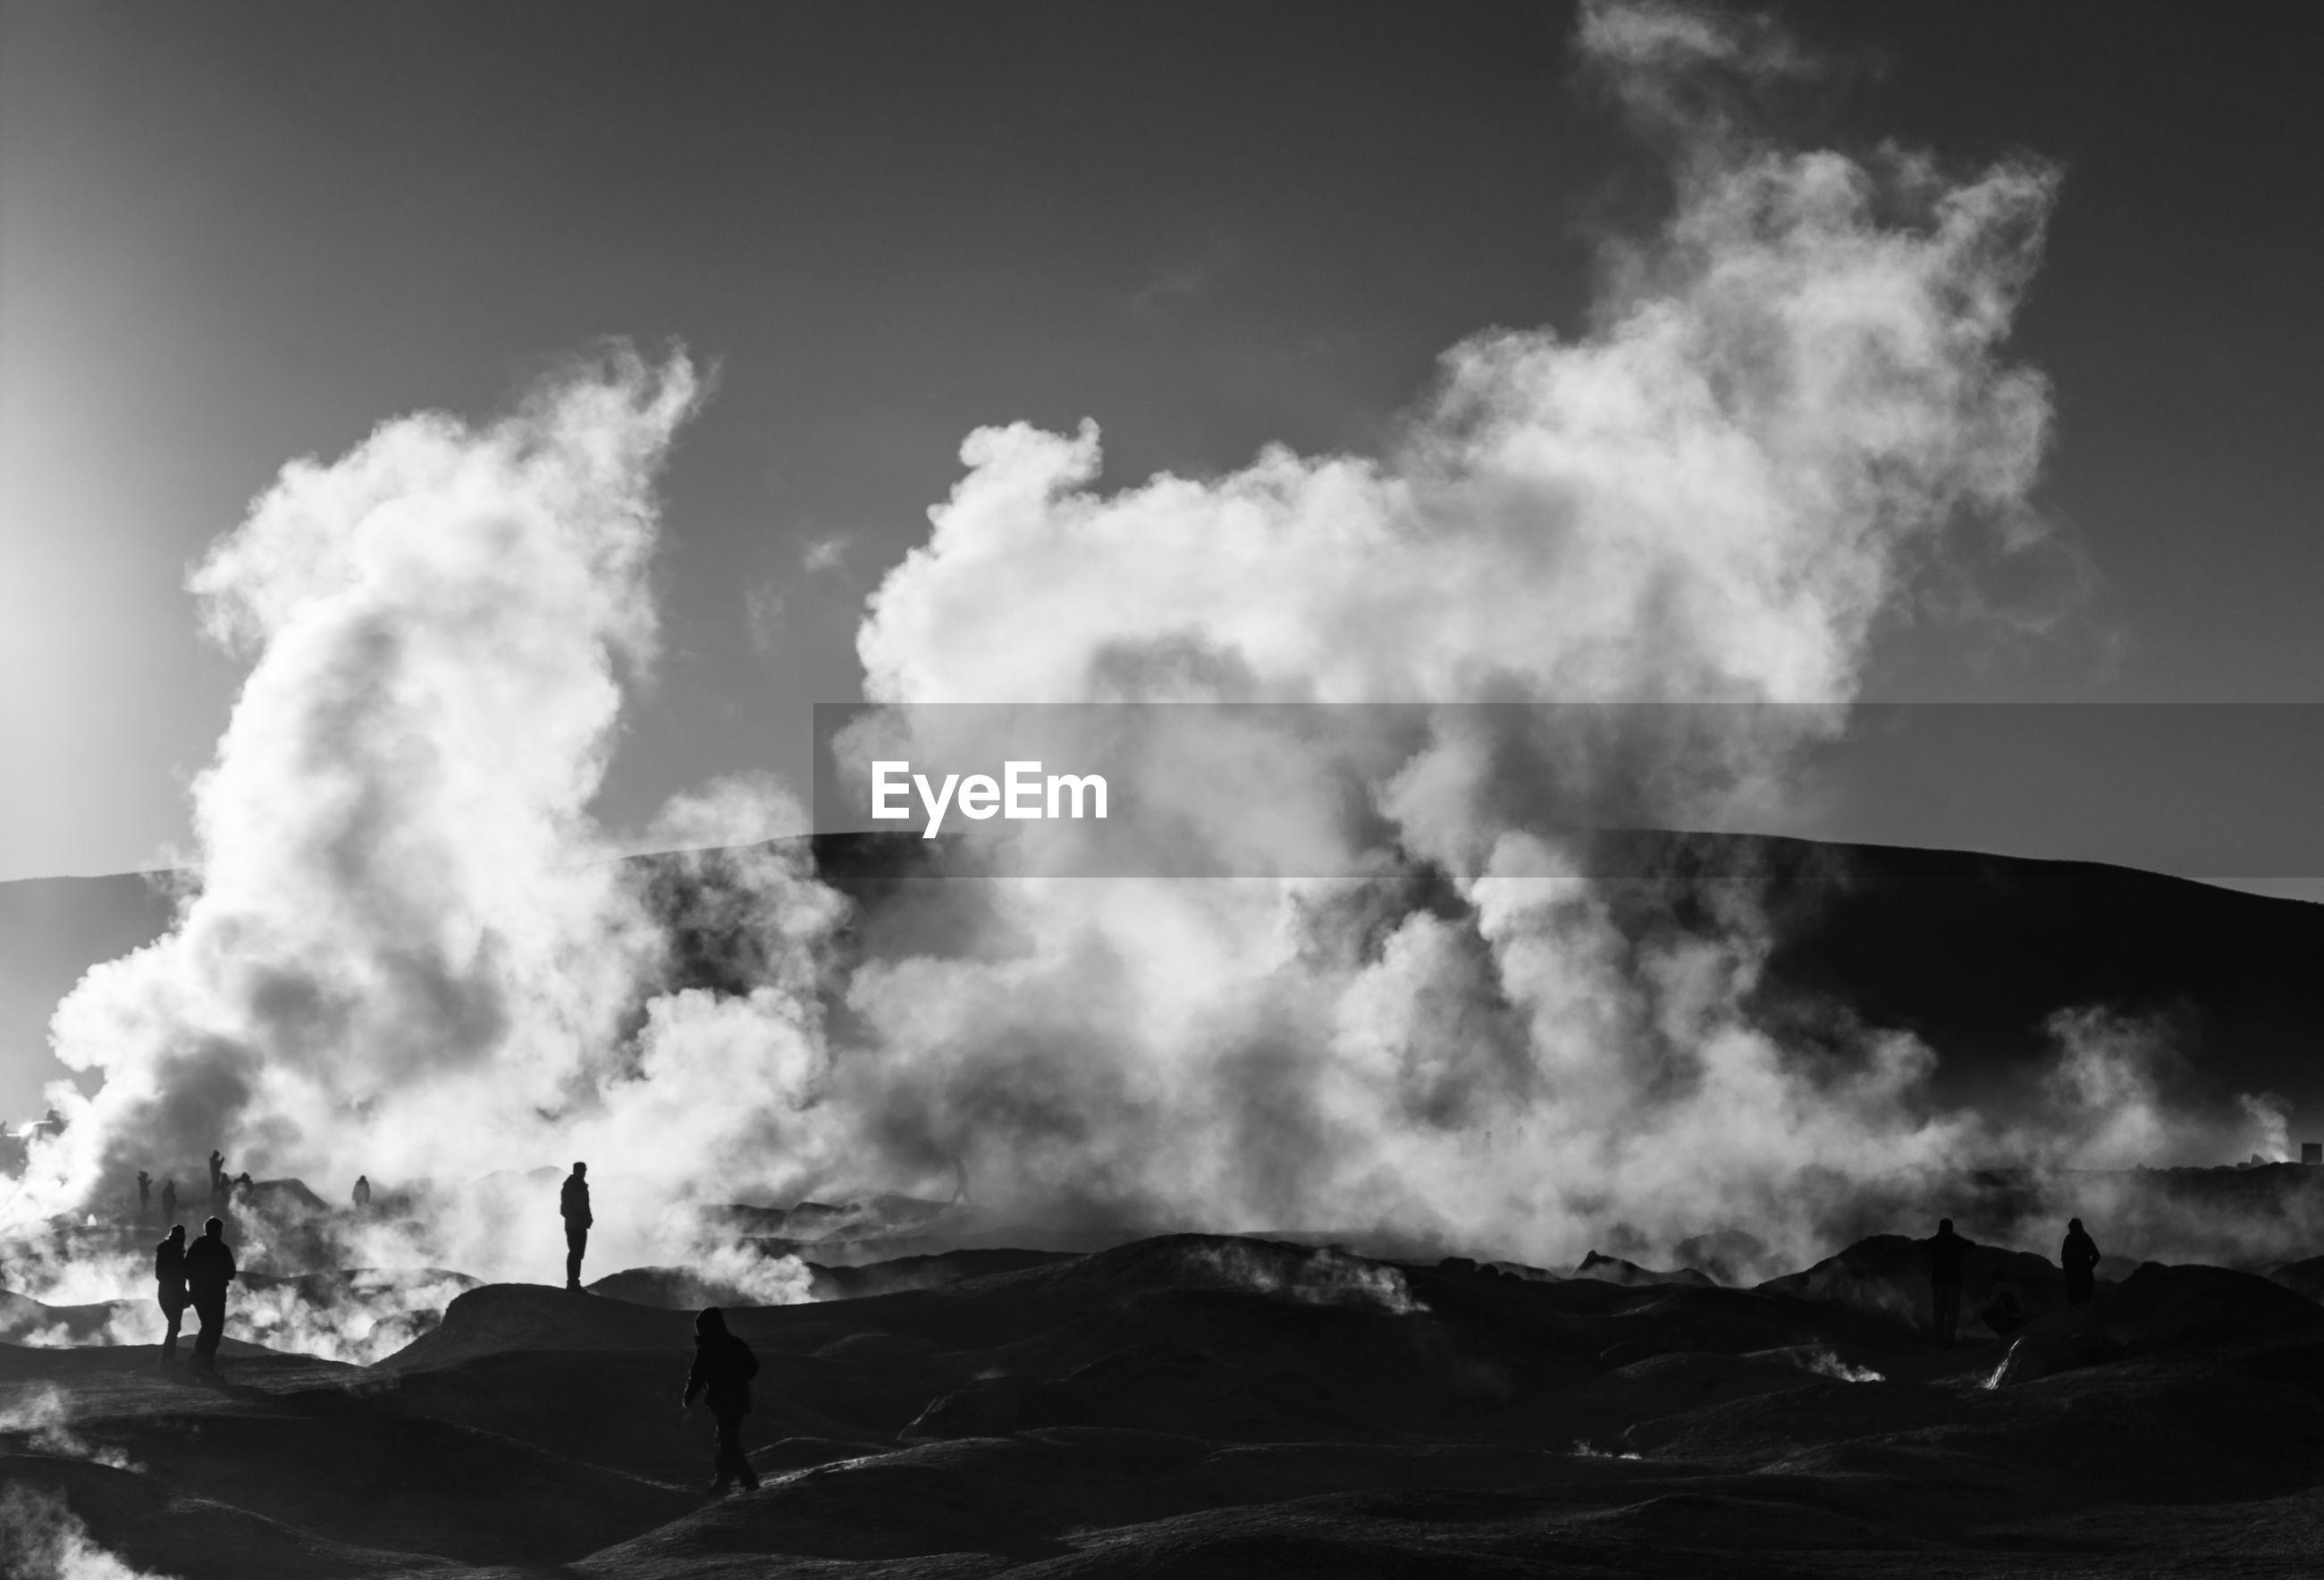 VIEW OF SMOKE EMITTING FROM MOUNTAIN